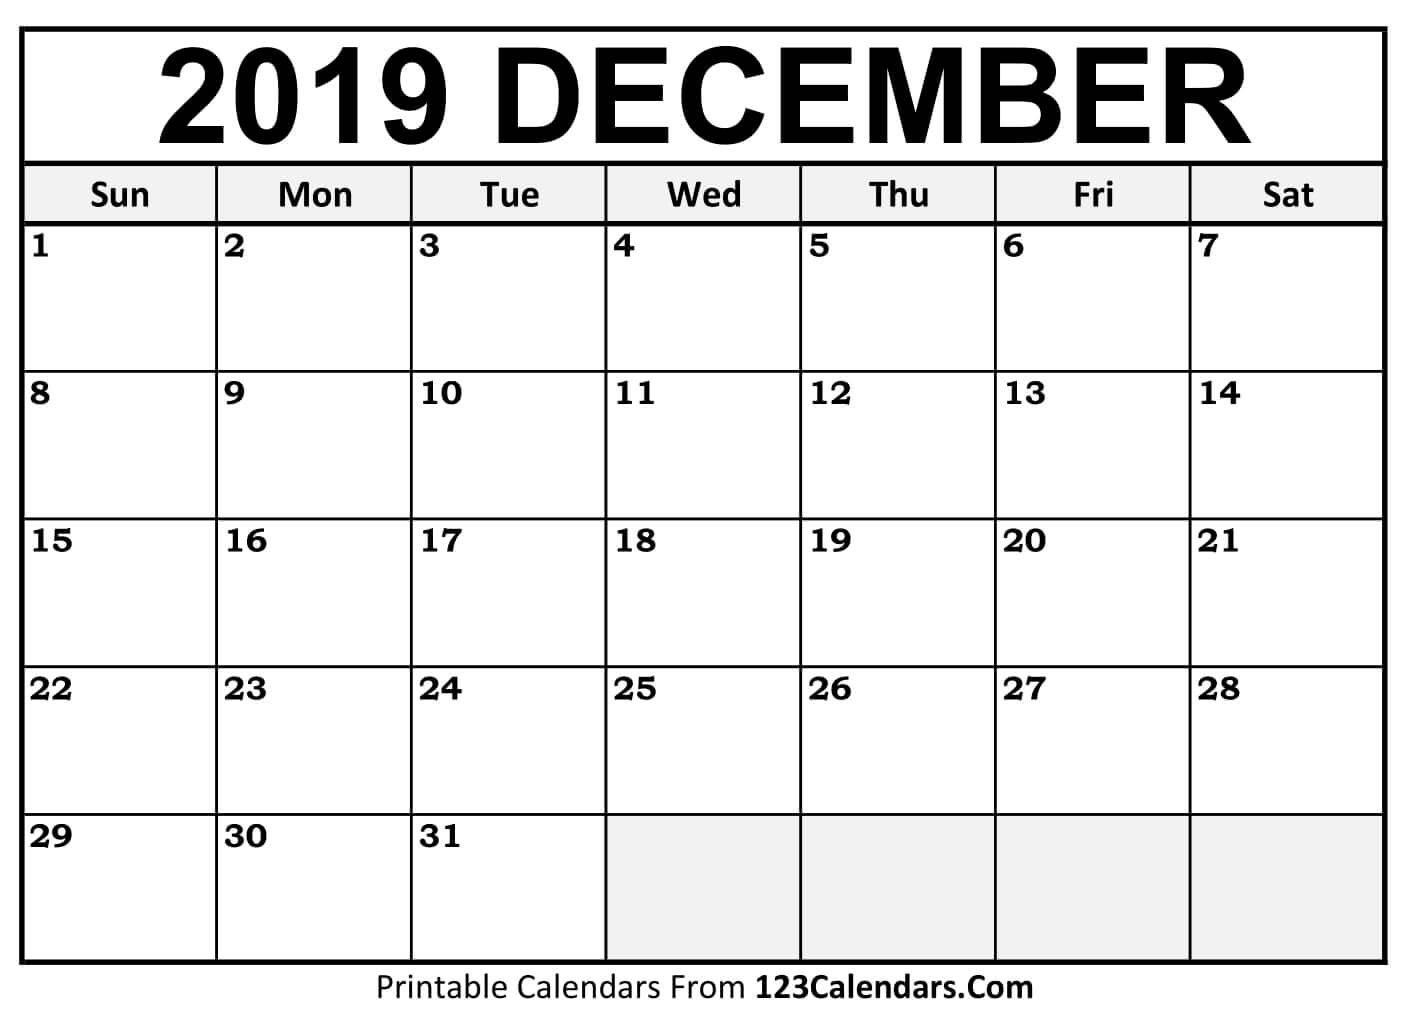 Printable December 2019 Calendar Templates - 123Calendars Calendar 2019 December